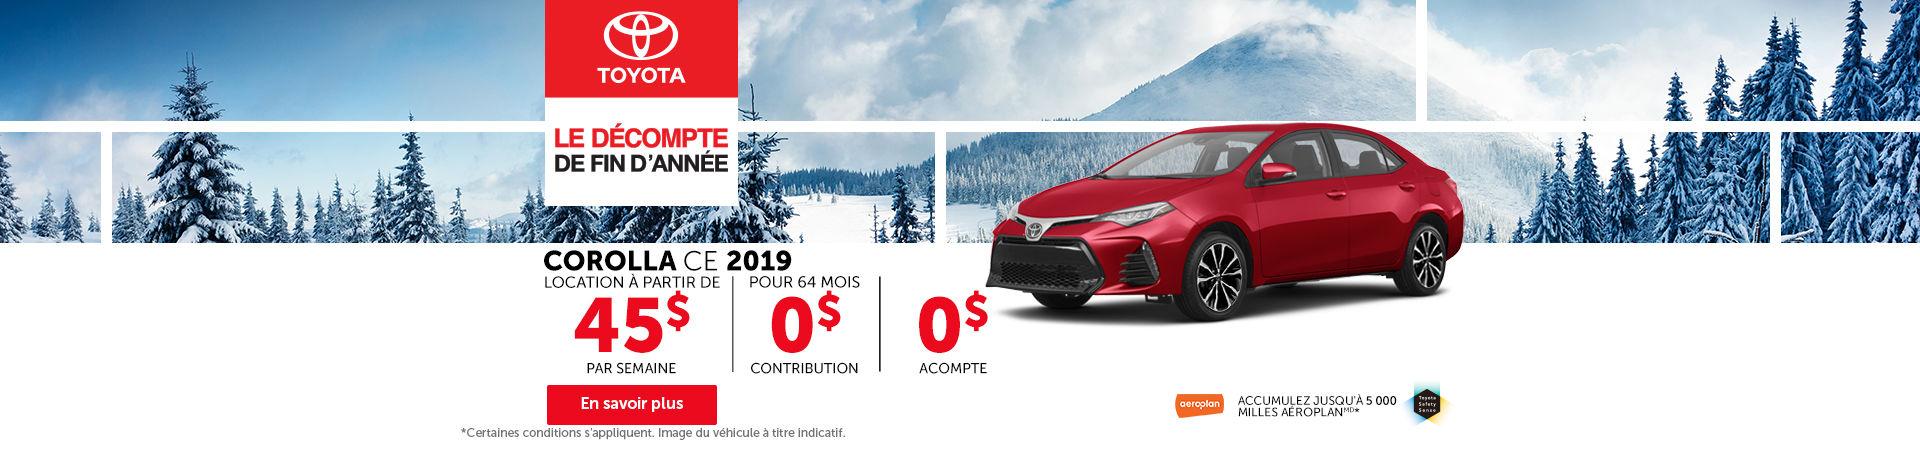 Toyota Corolla - Headers